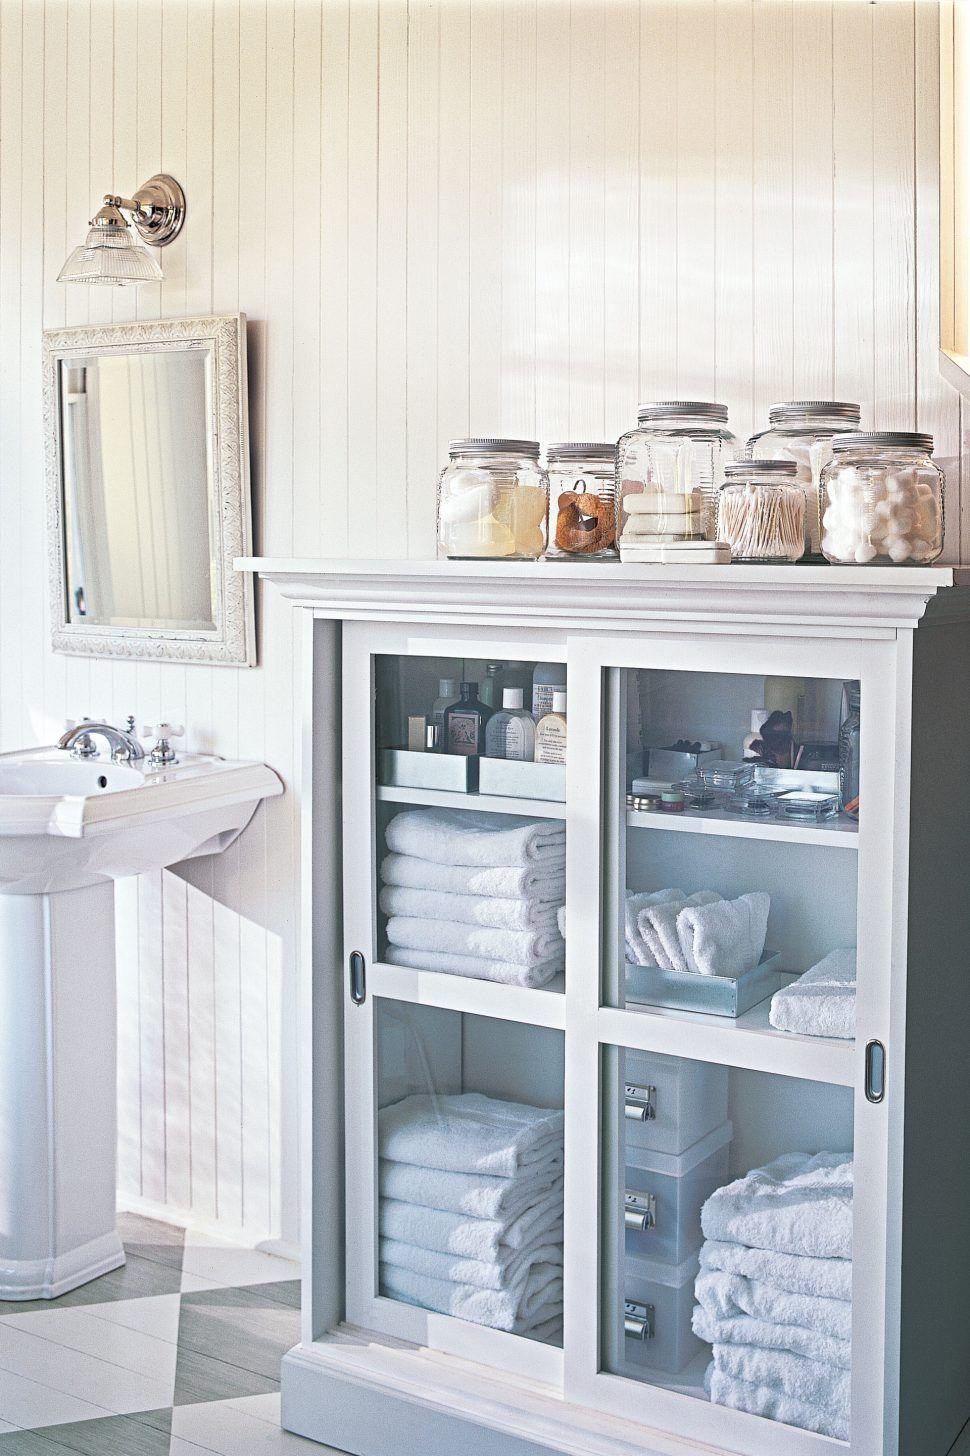 100+ Very Small Bathroom Storage Ideas - Best Interior Paint Brand ...